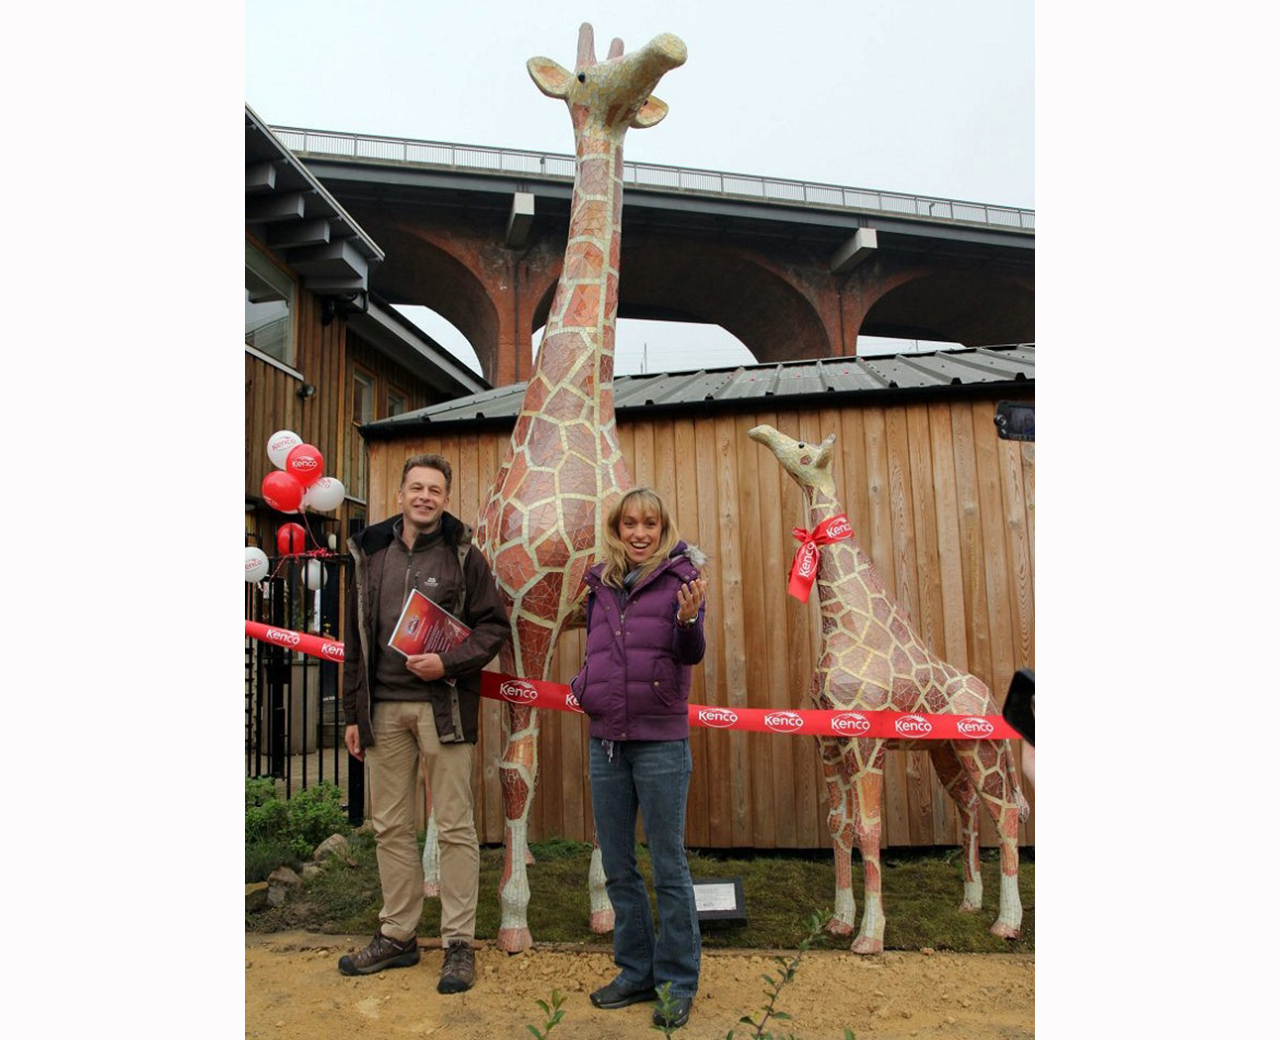 Kenco Giraffe